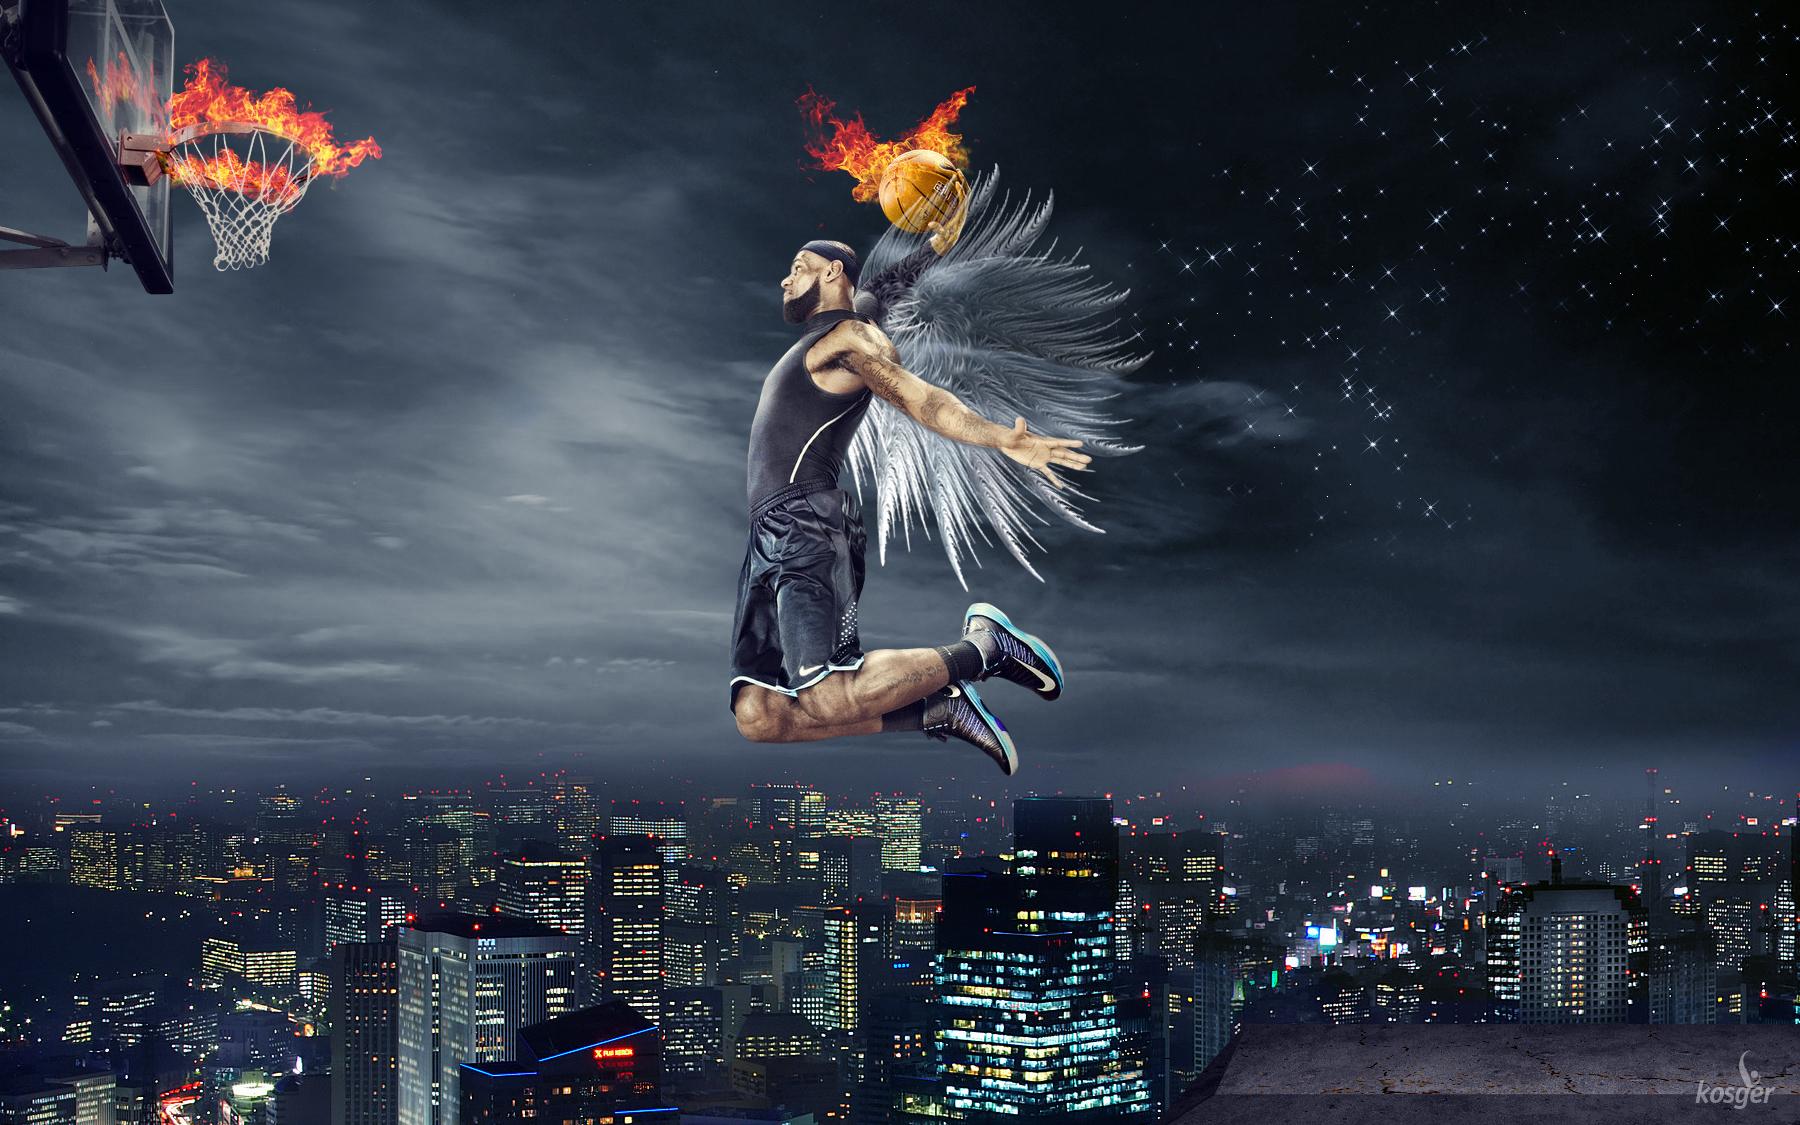 Lebron James basketball fly - ПРОДАЁТСЯ